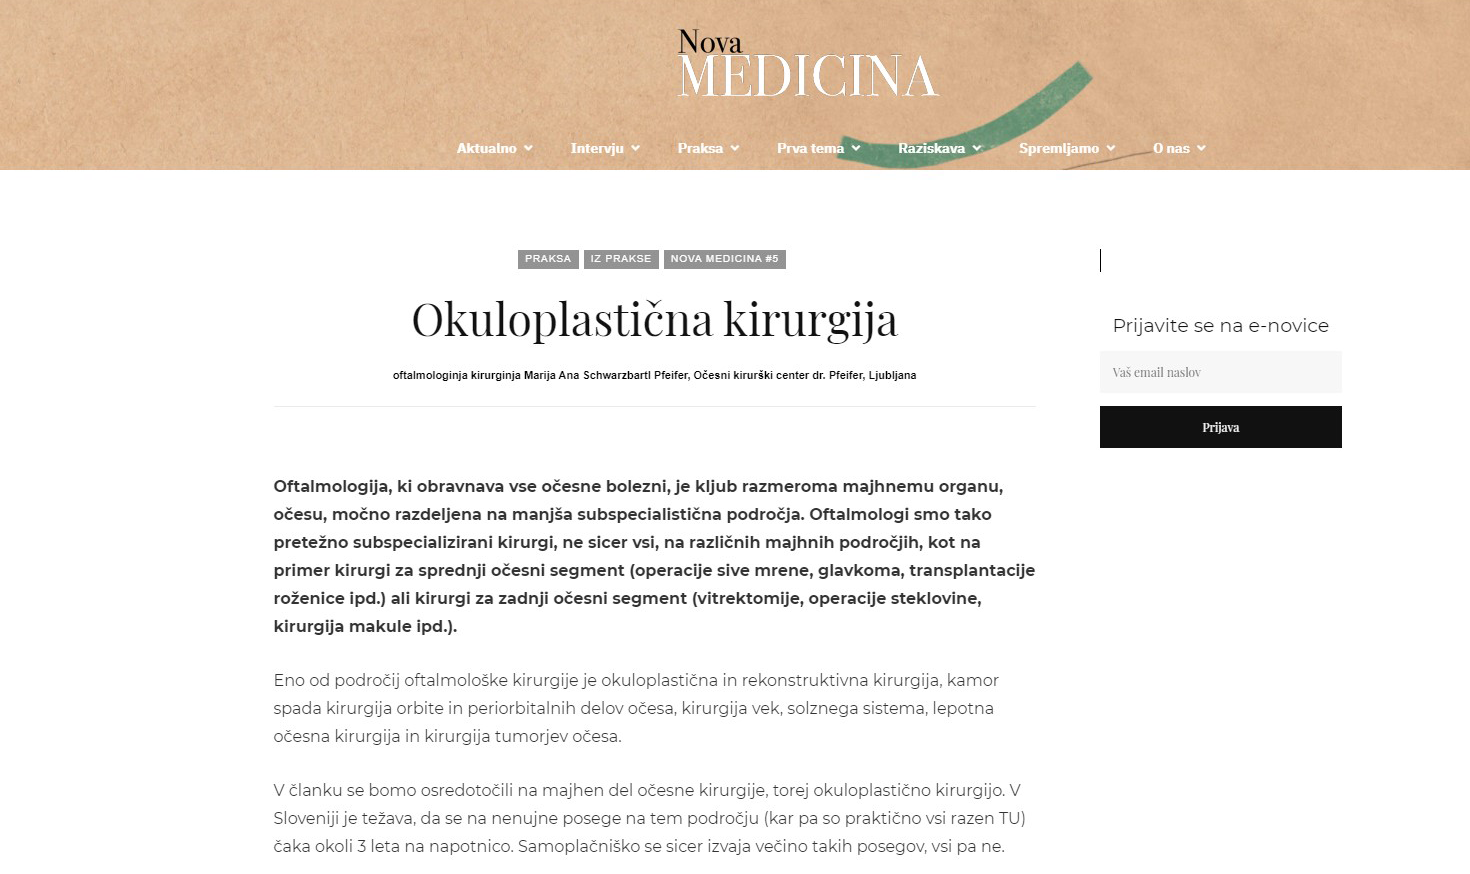 Revija Nova Medicina - Okuloplastična kirurgija - april 2021